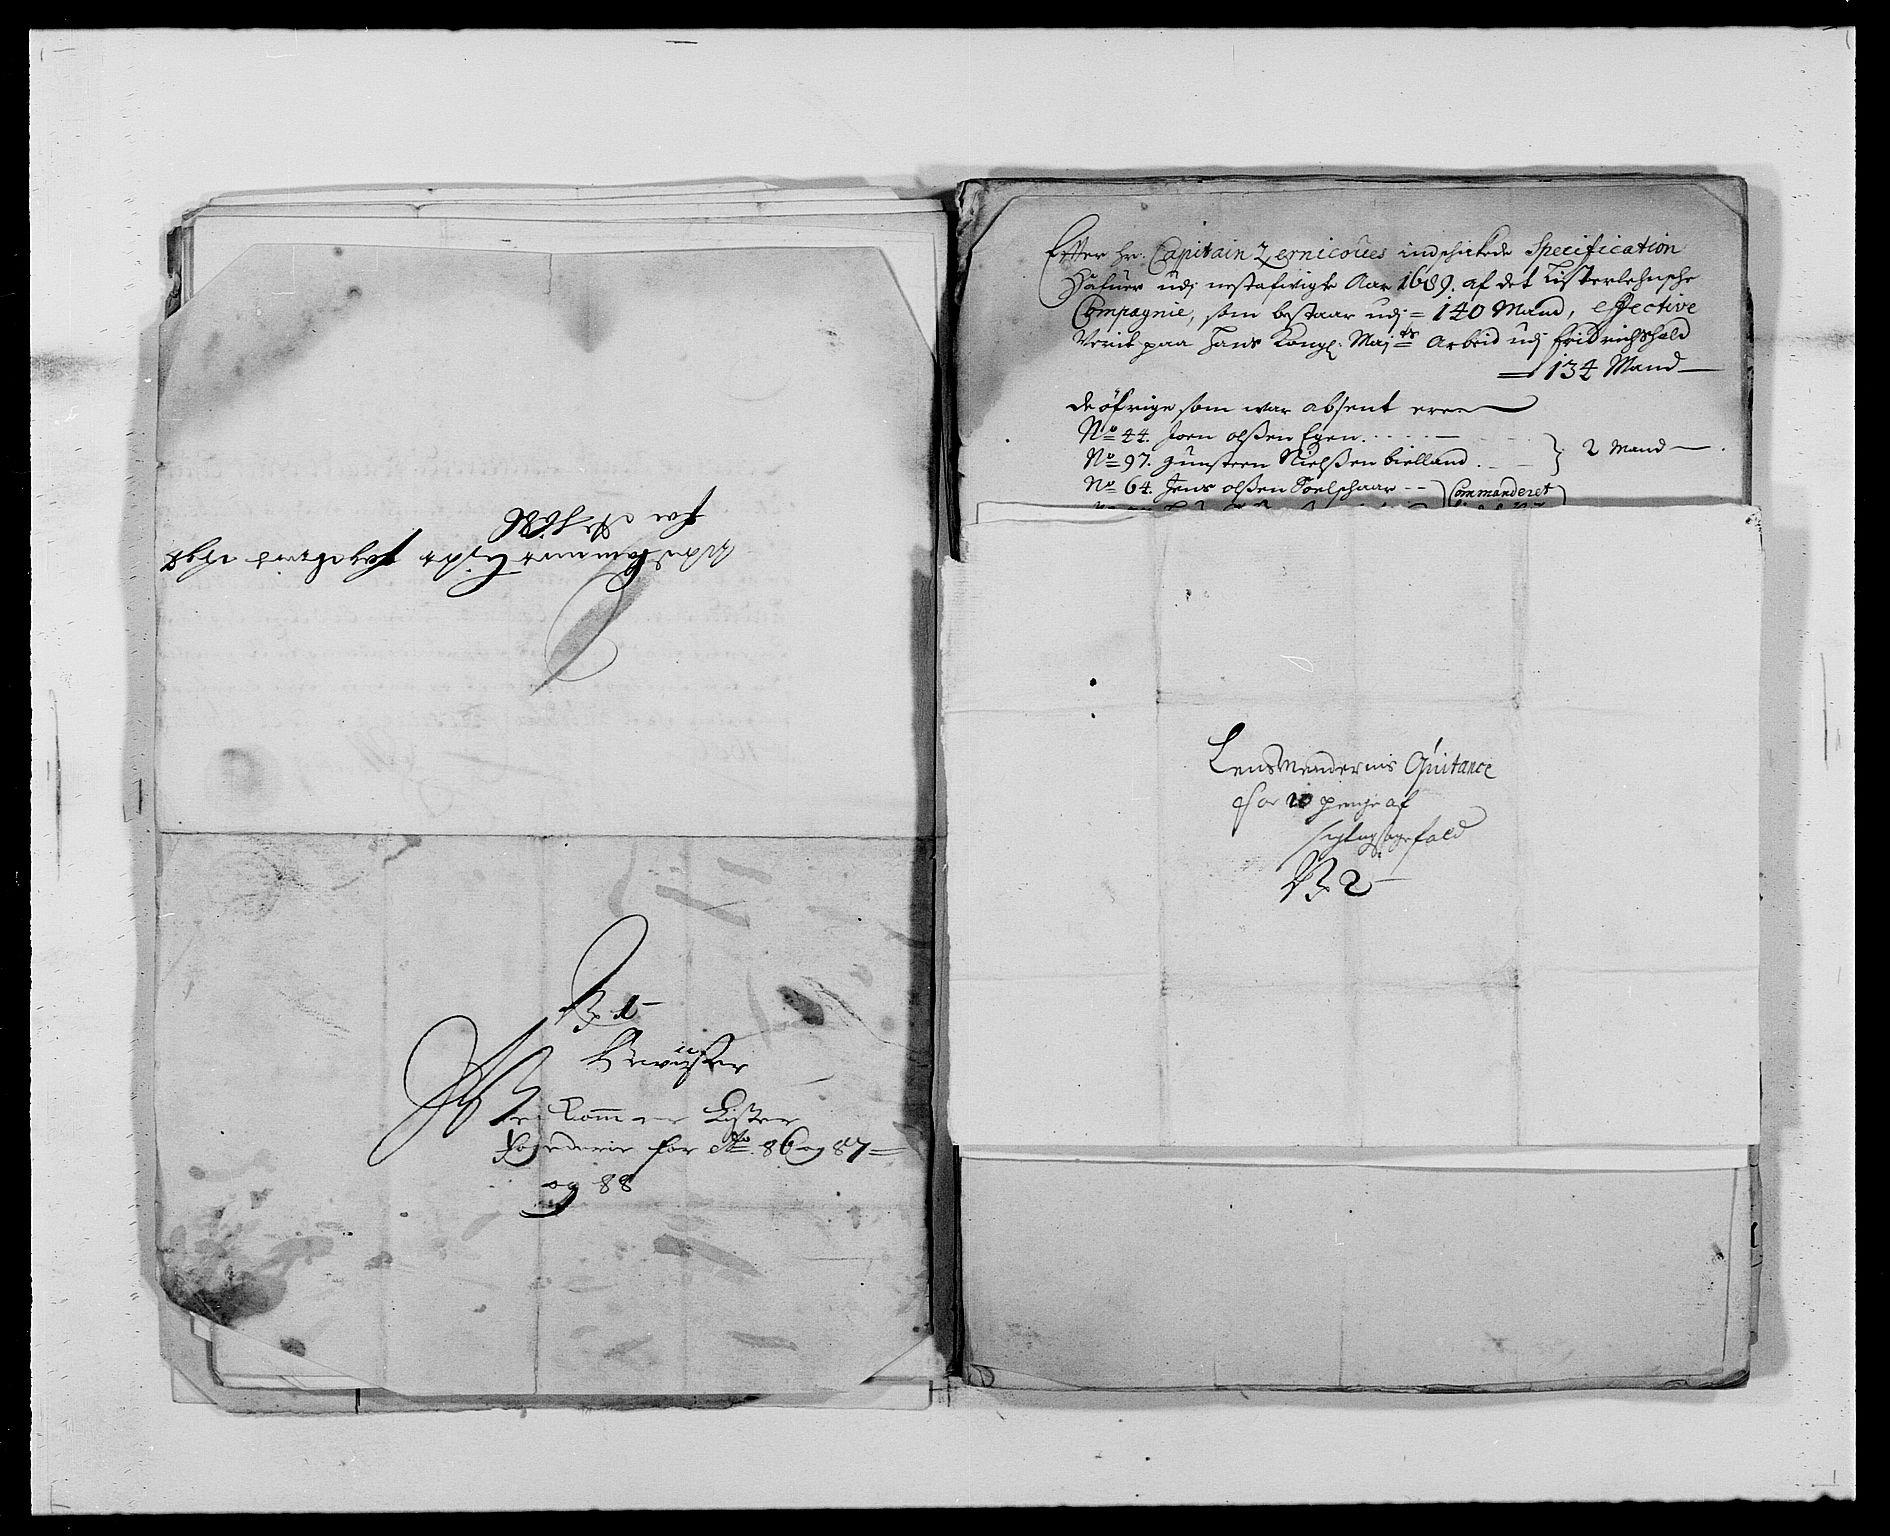 RA, Rentekammeret inntil 1814, Reviderte regnskaper, Fogderegnskap, R41/L2535: Fogderegnskap Lista, 1686-1689, s. 47